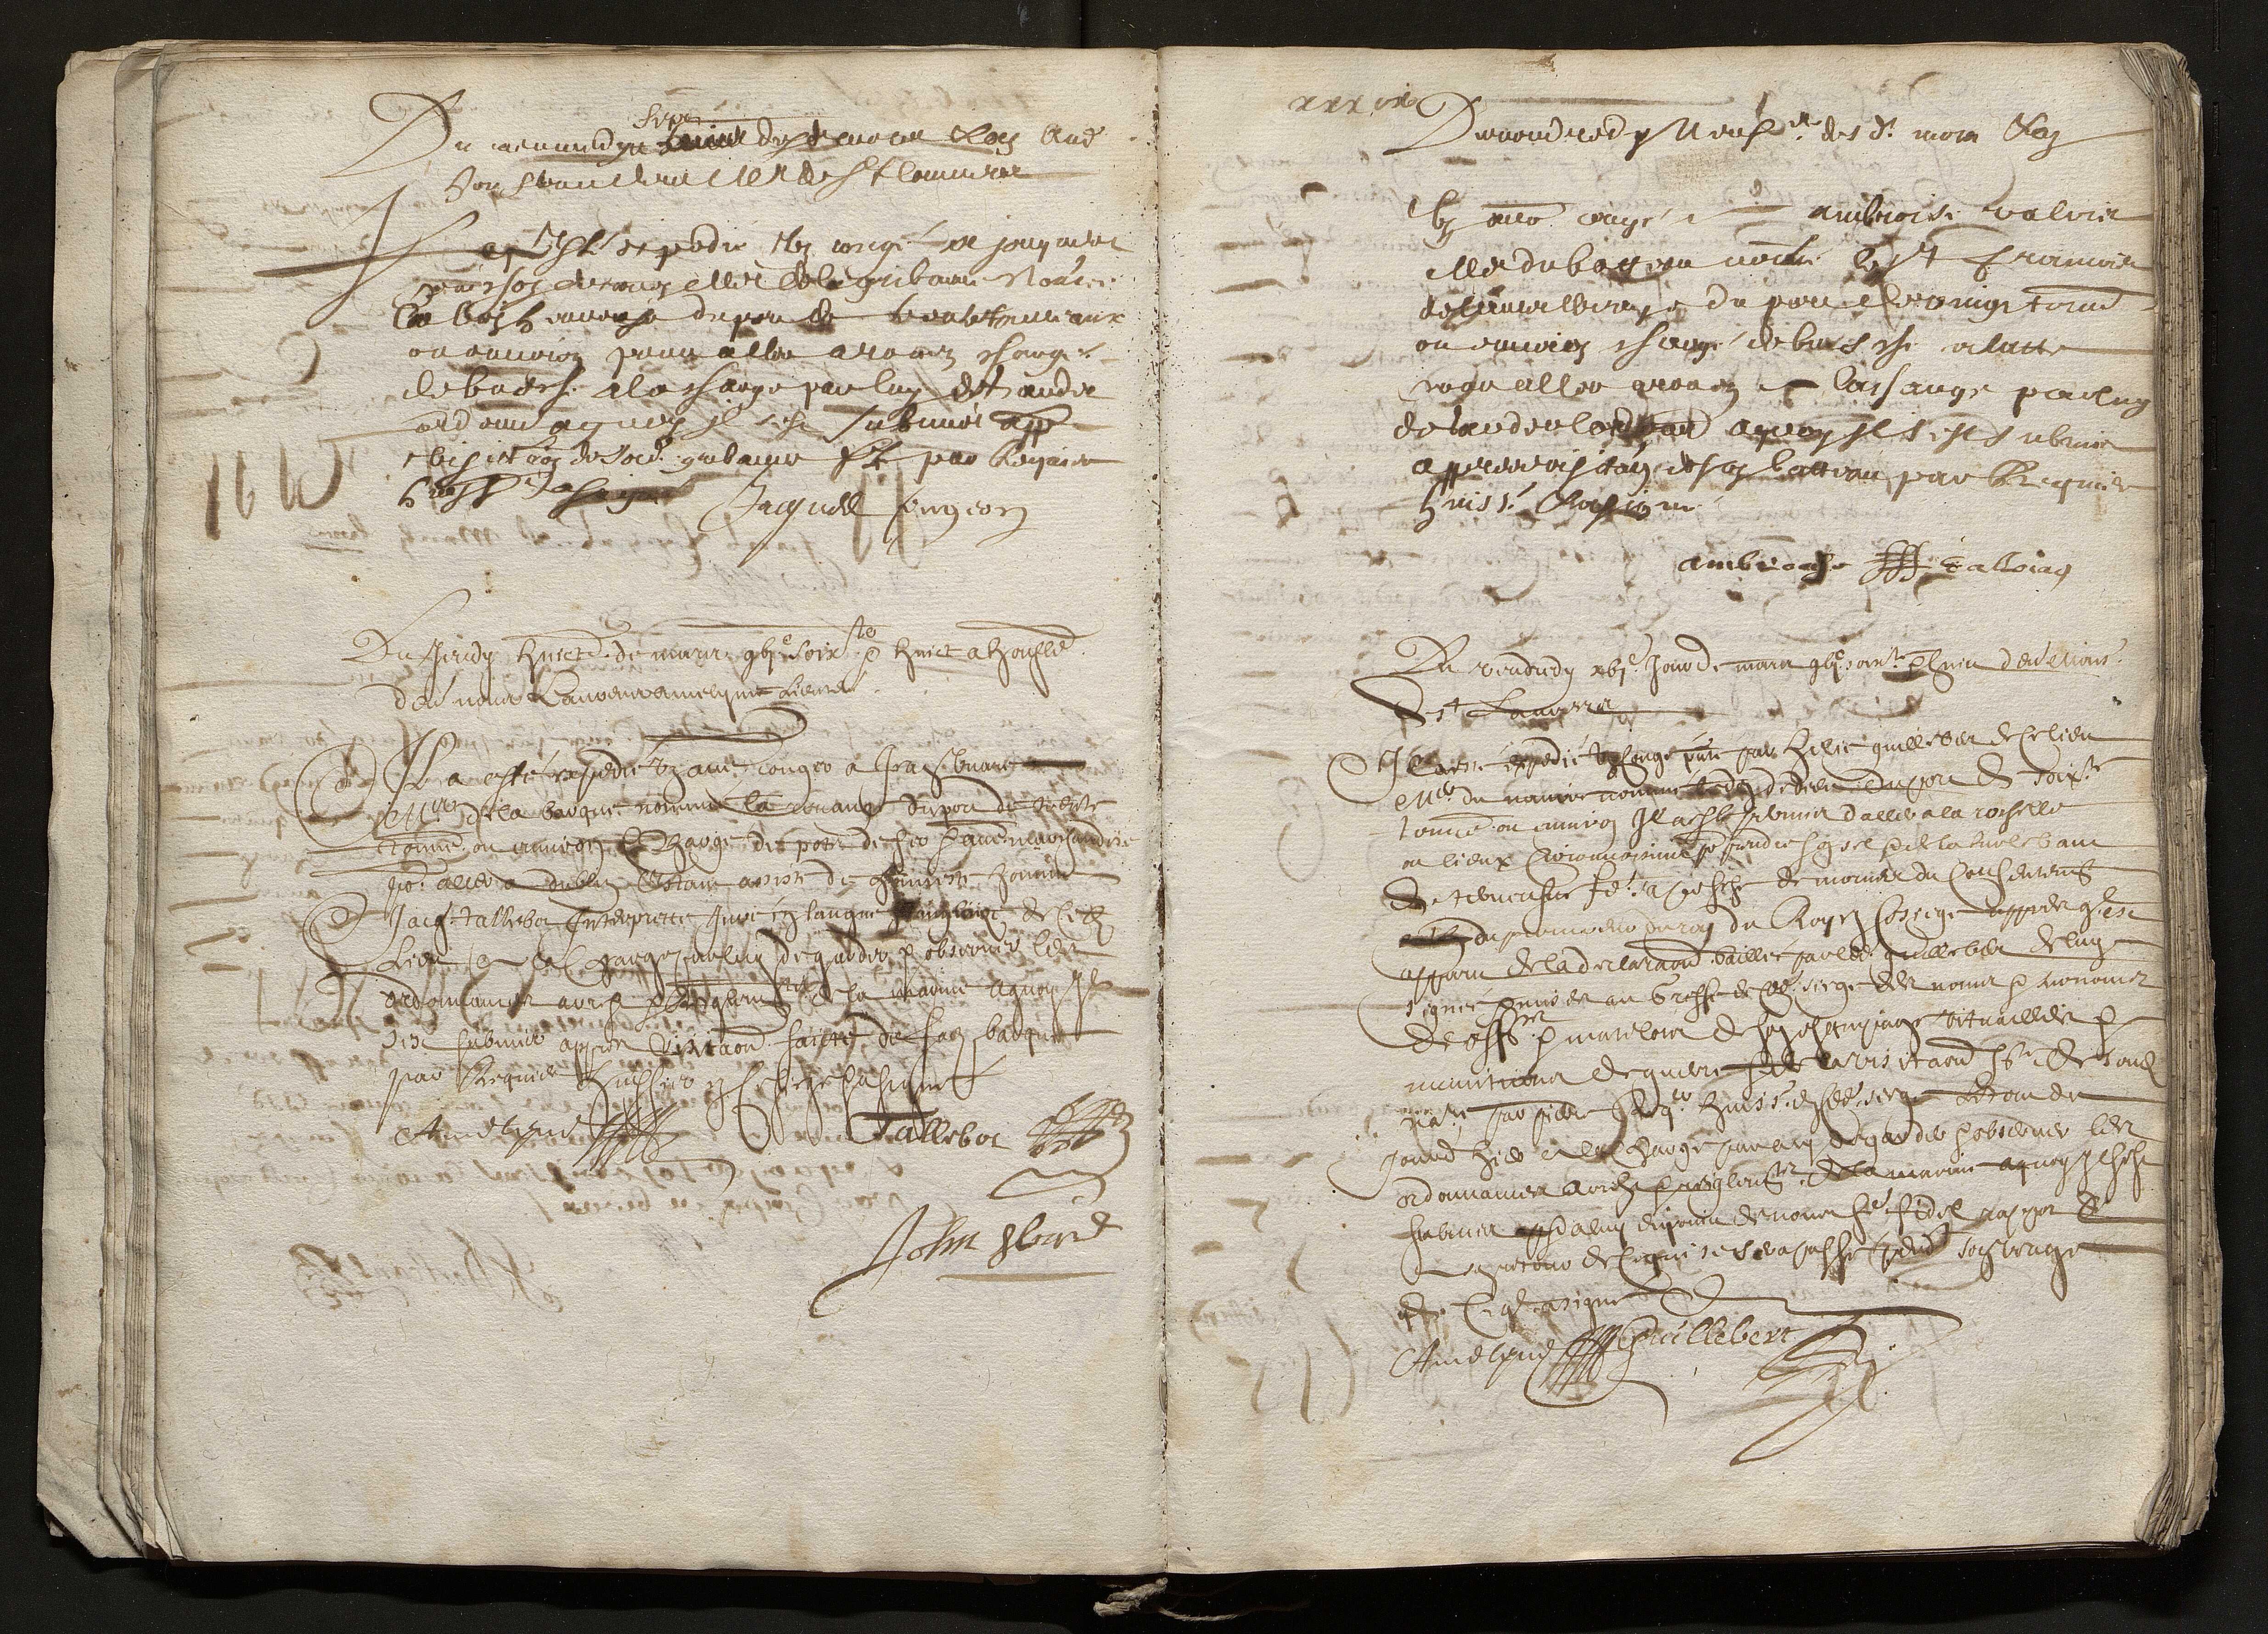 20 juin 1667-7 septembre 1669